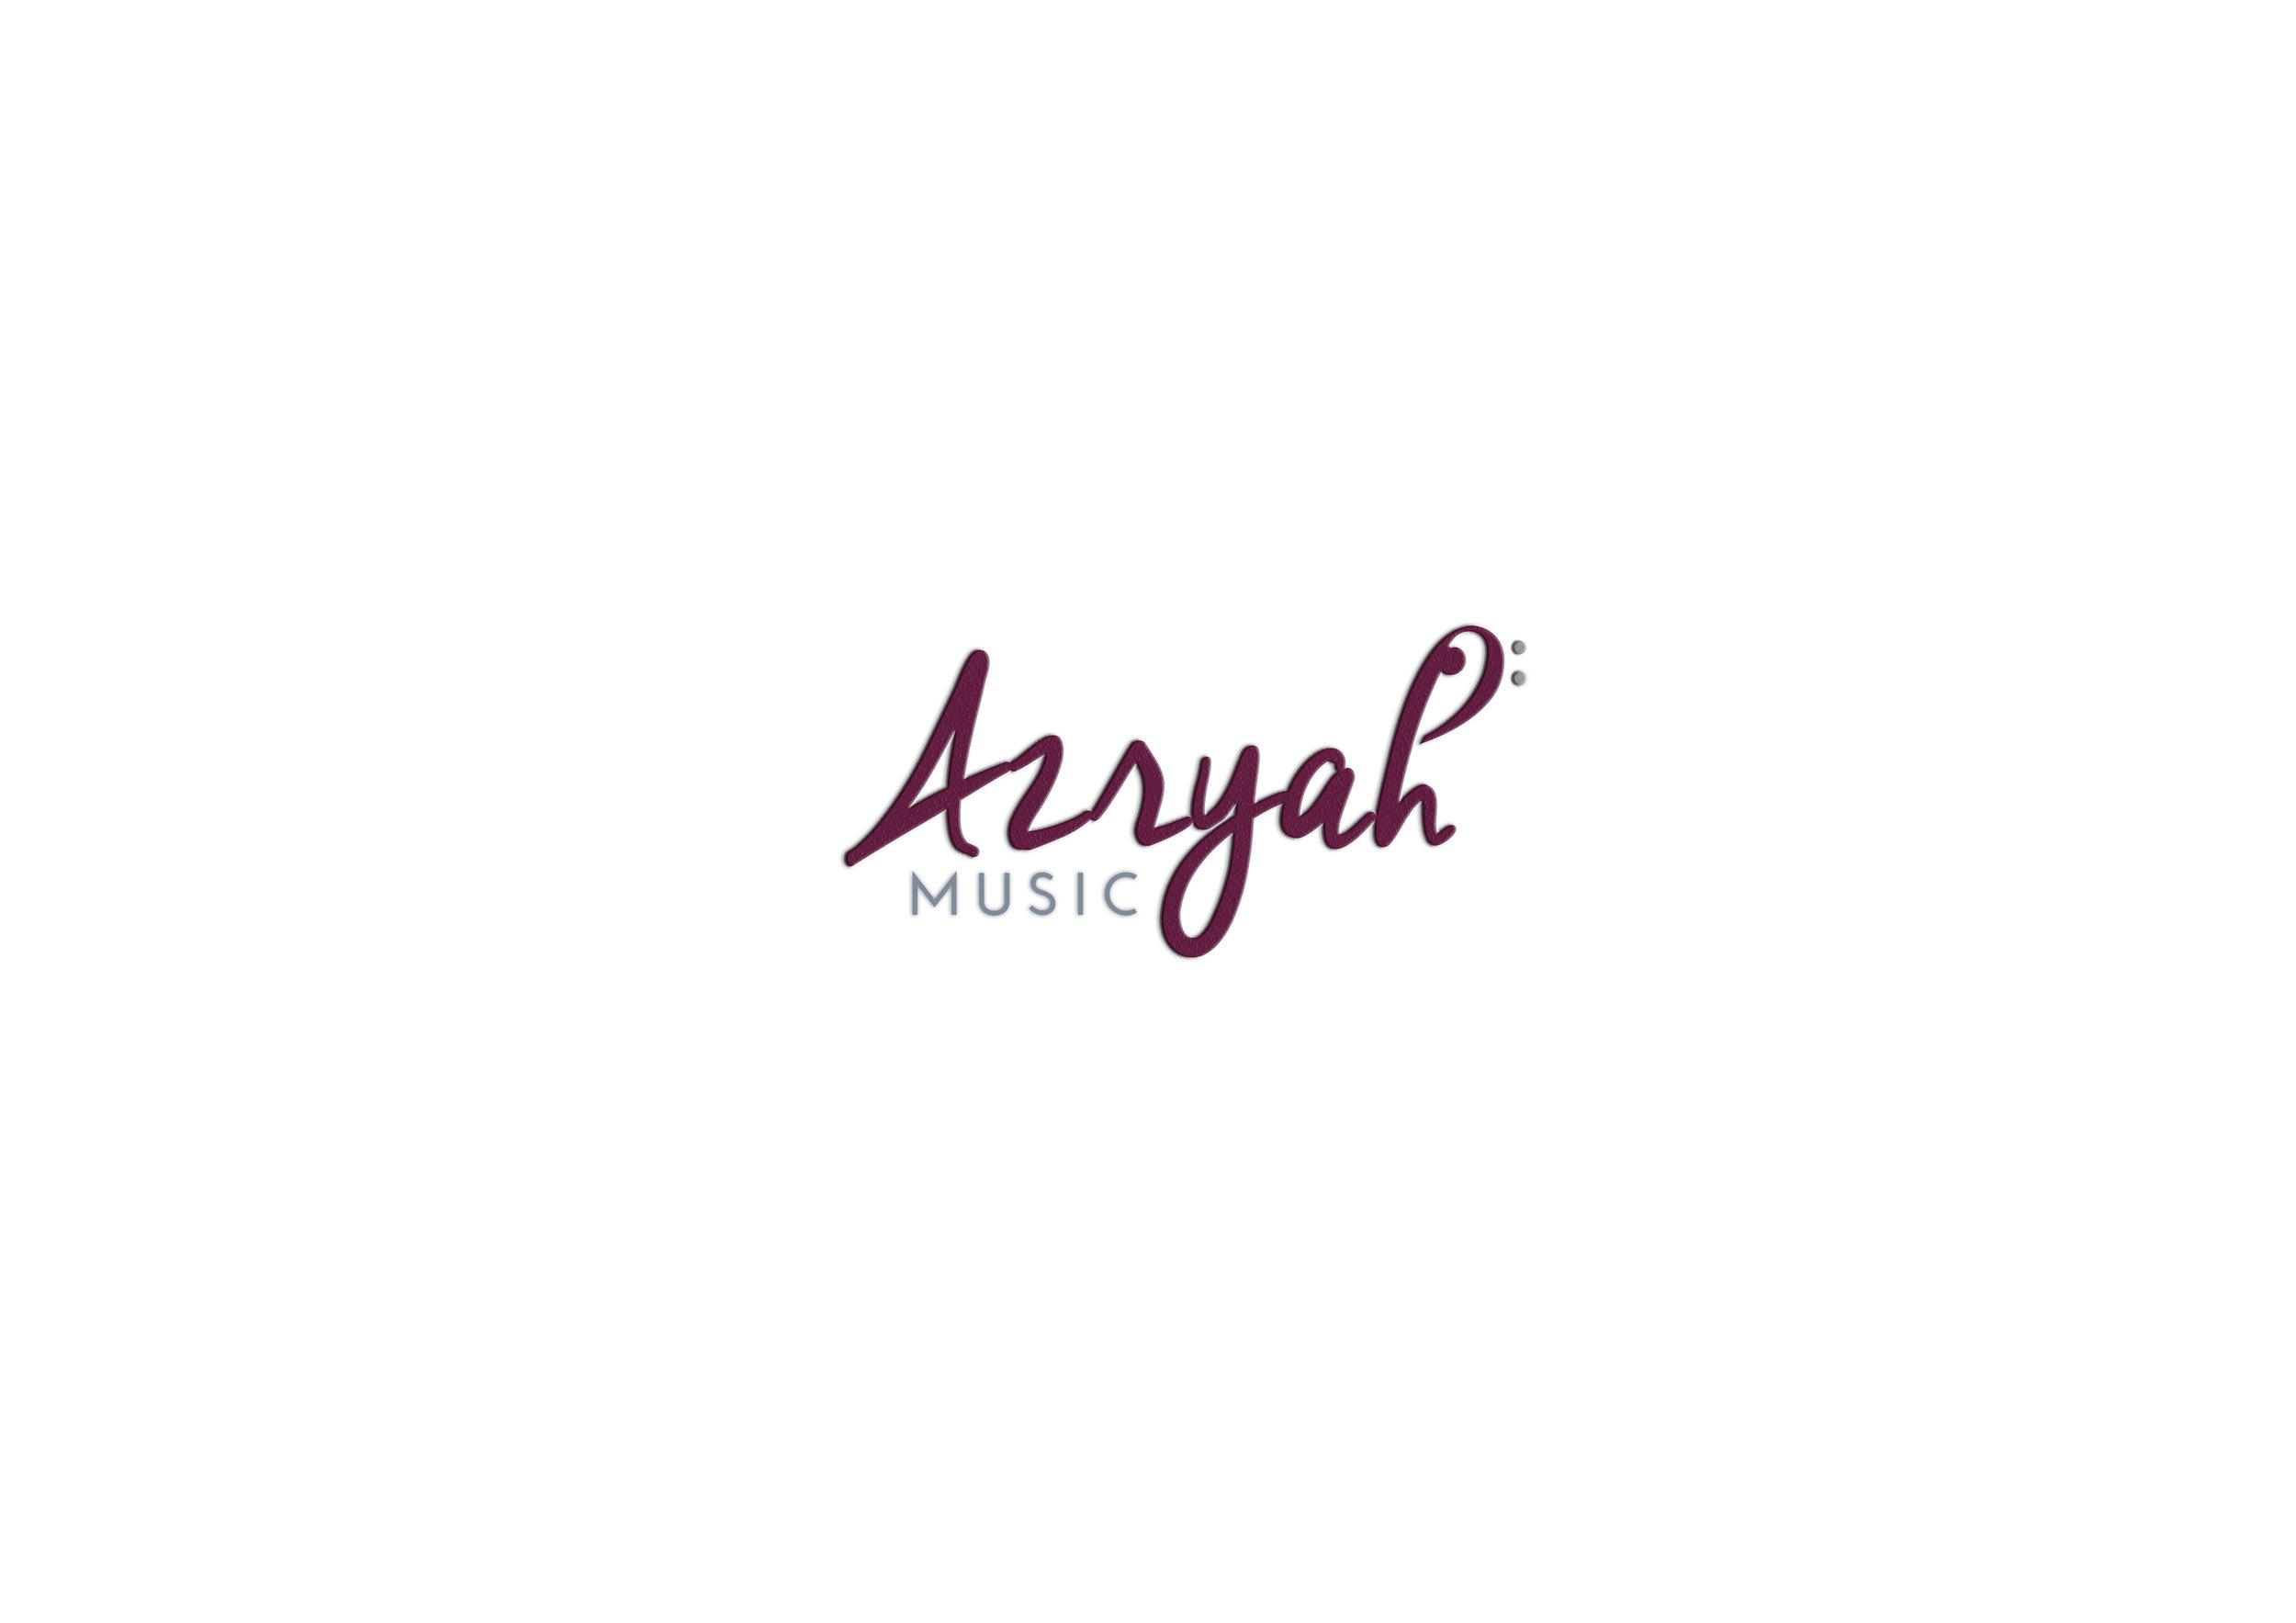 Ayzrah Music Final.jpg